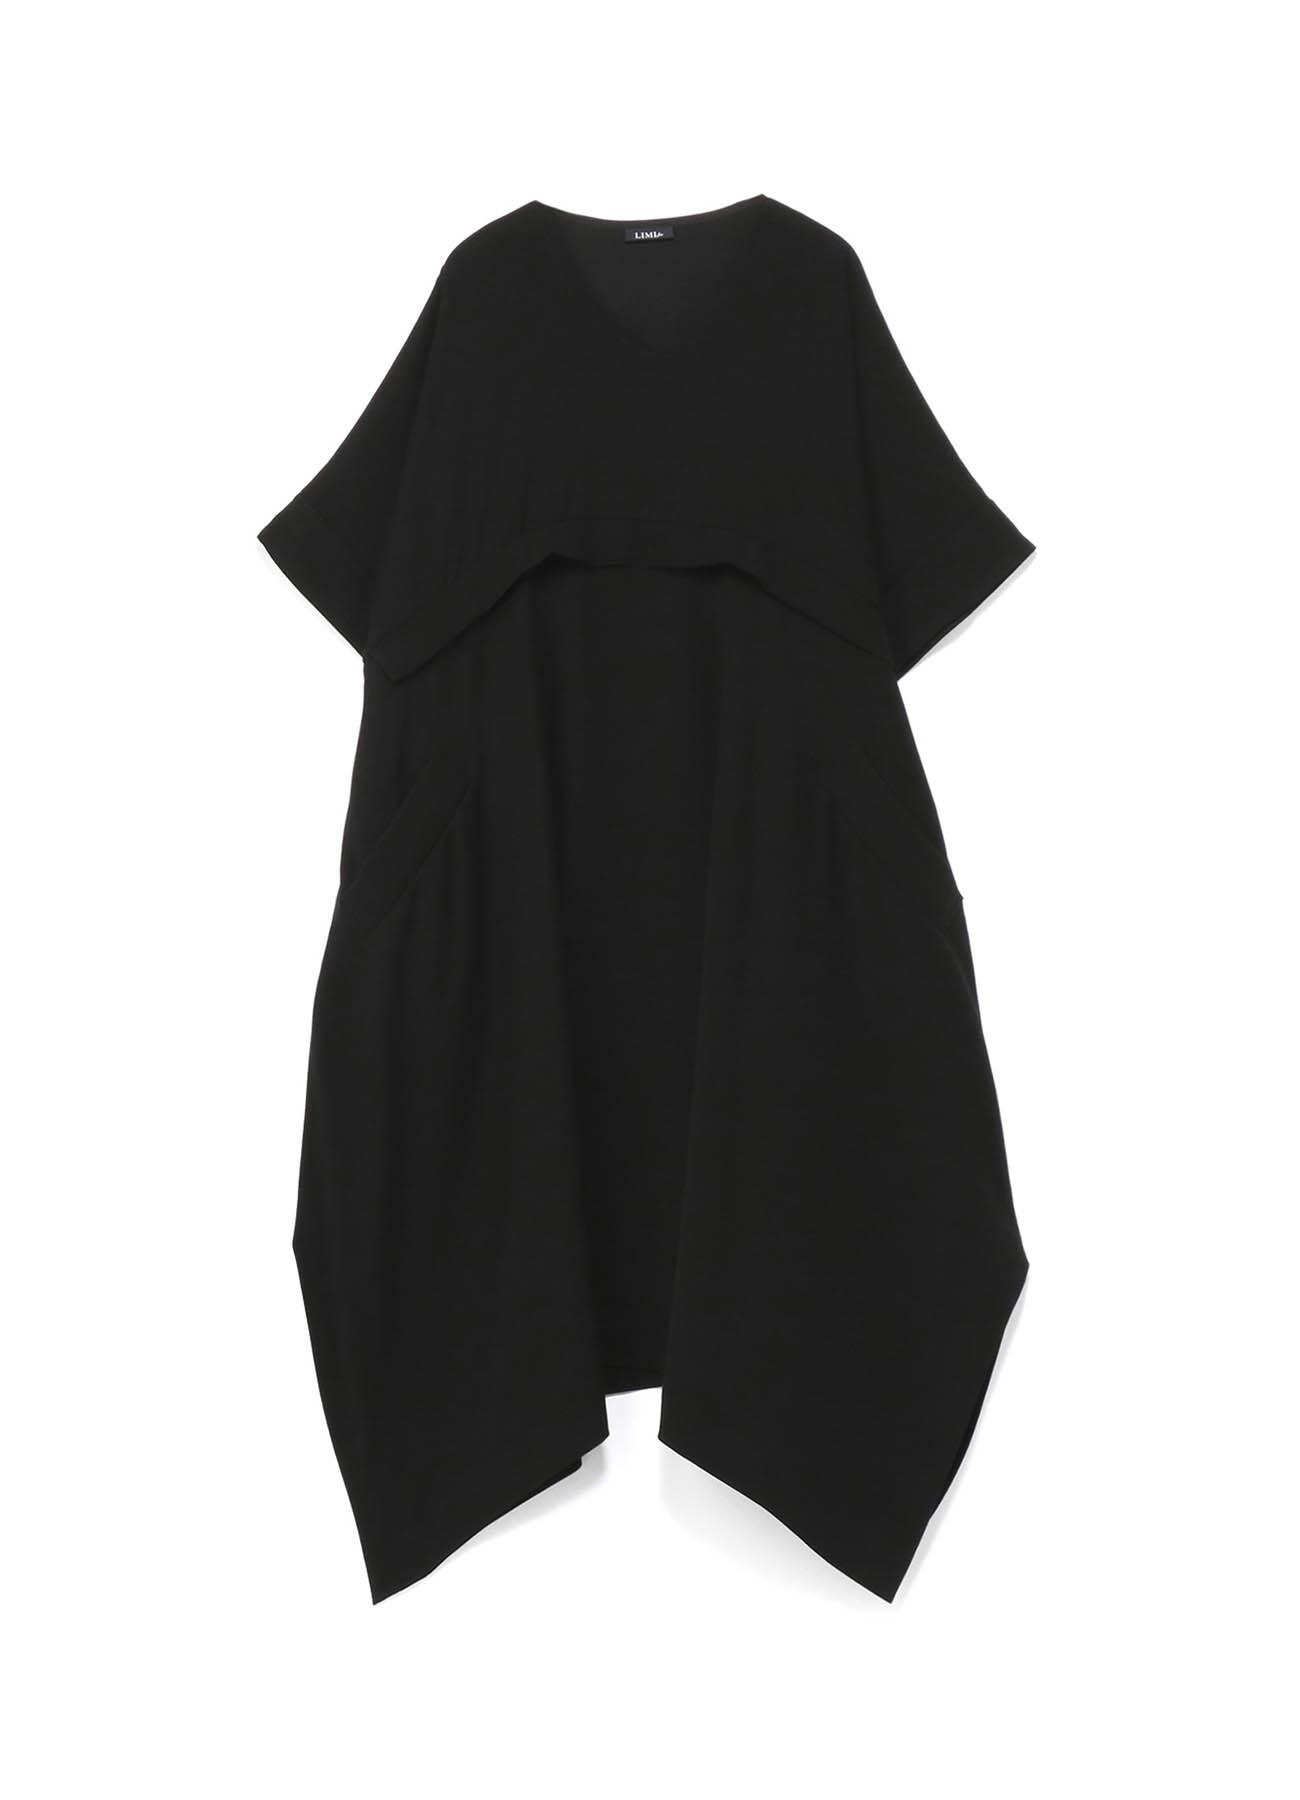 Double Satin V-Neck Flare Dress A